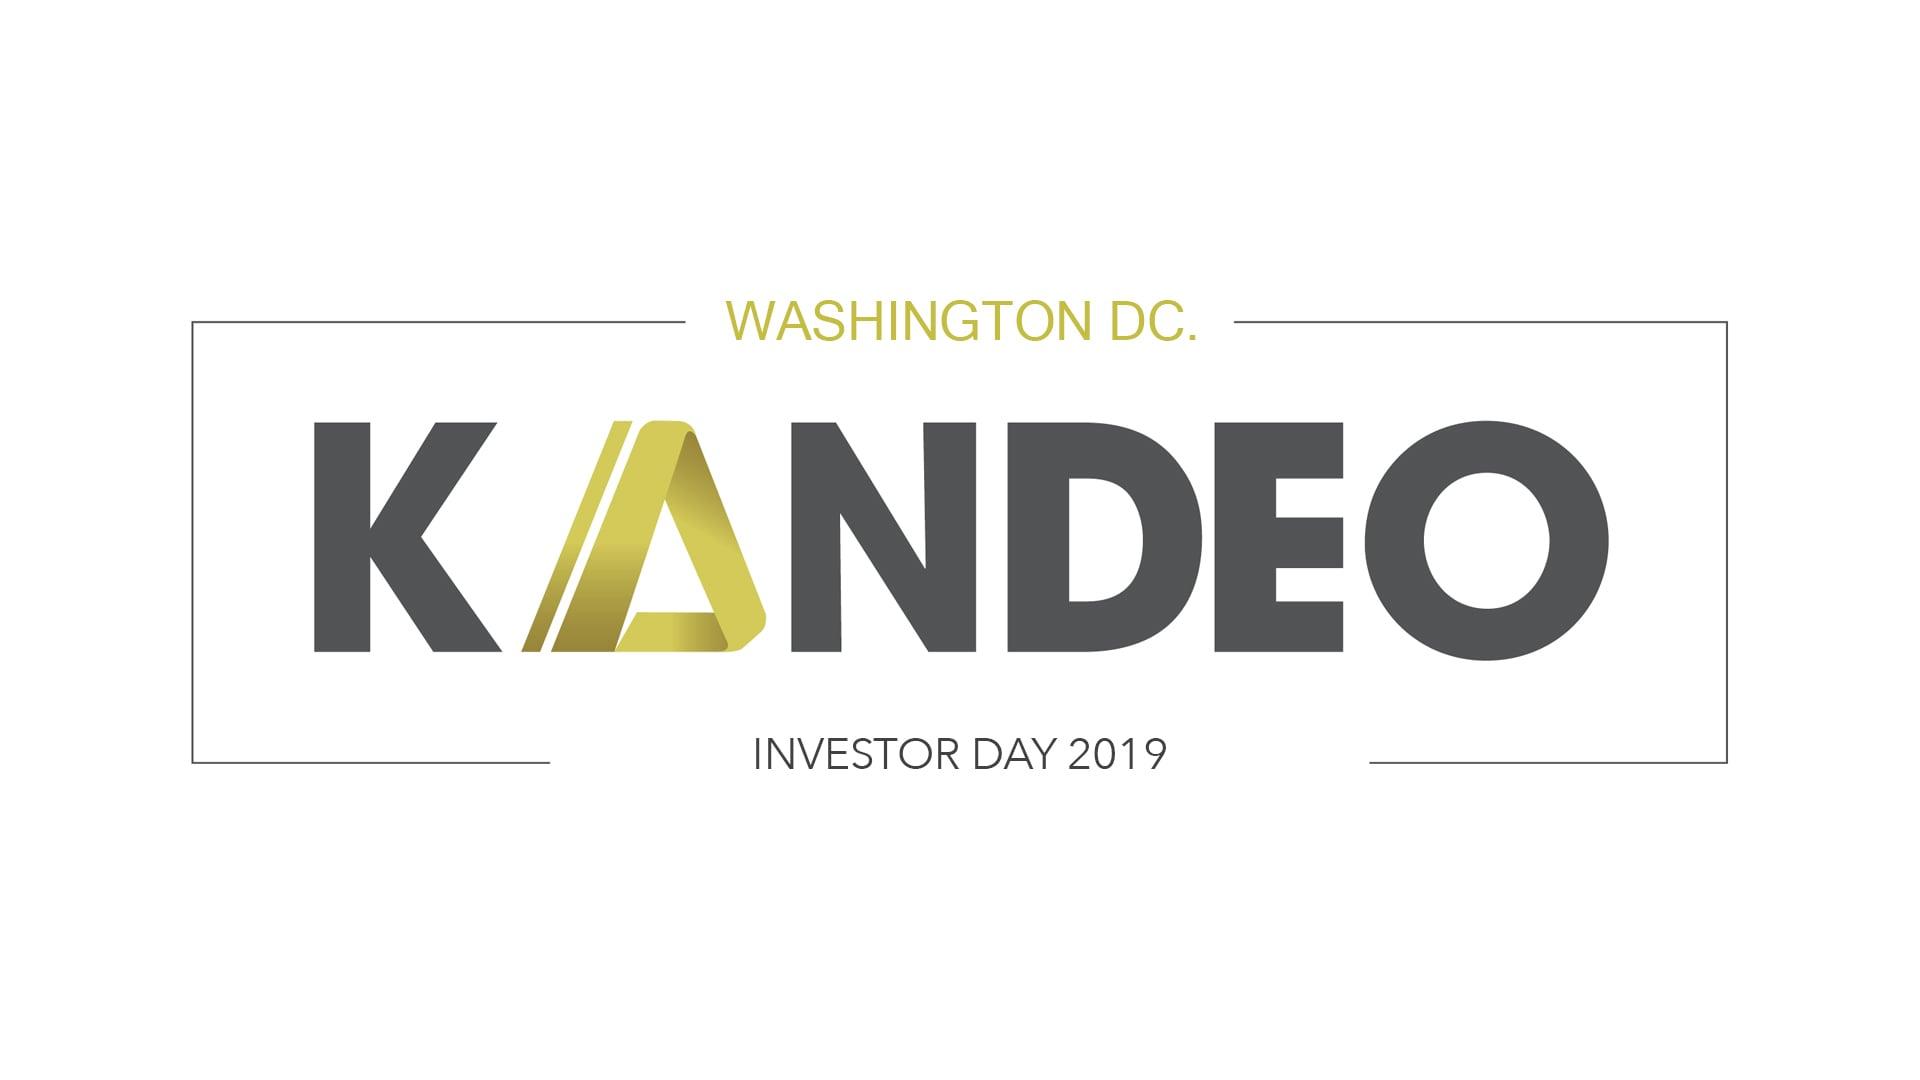 Kandeo Investor Day @ Washington DC 2019